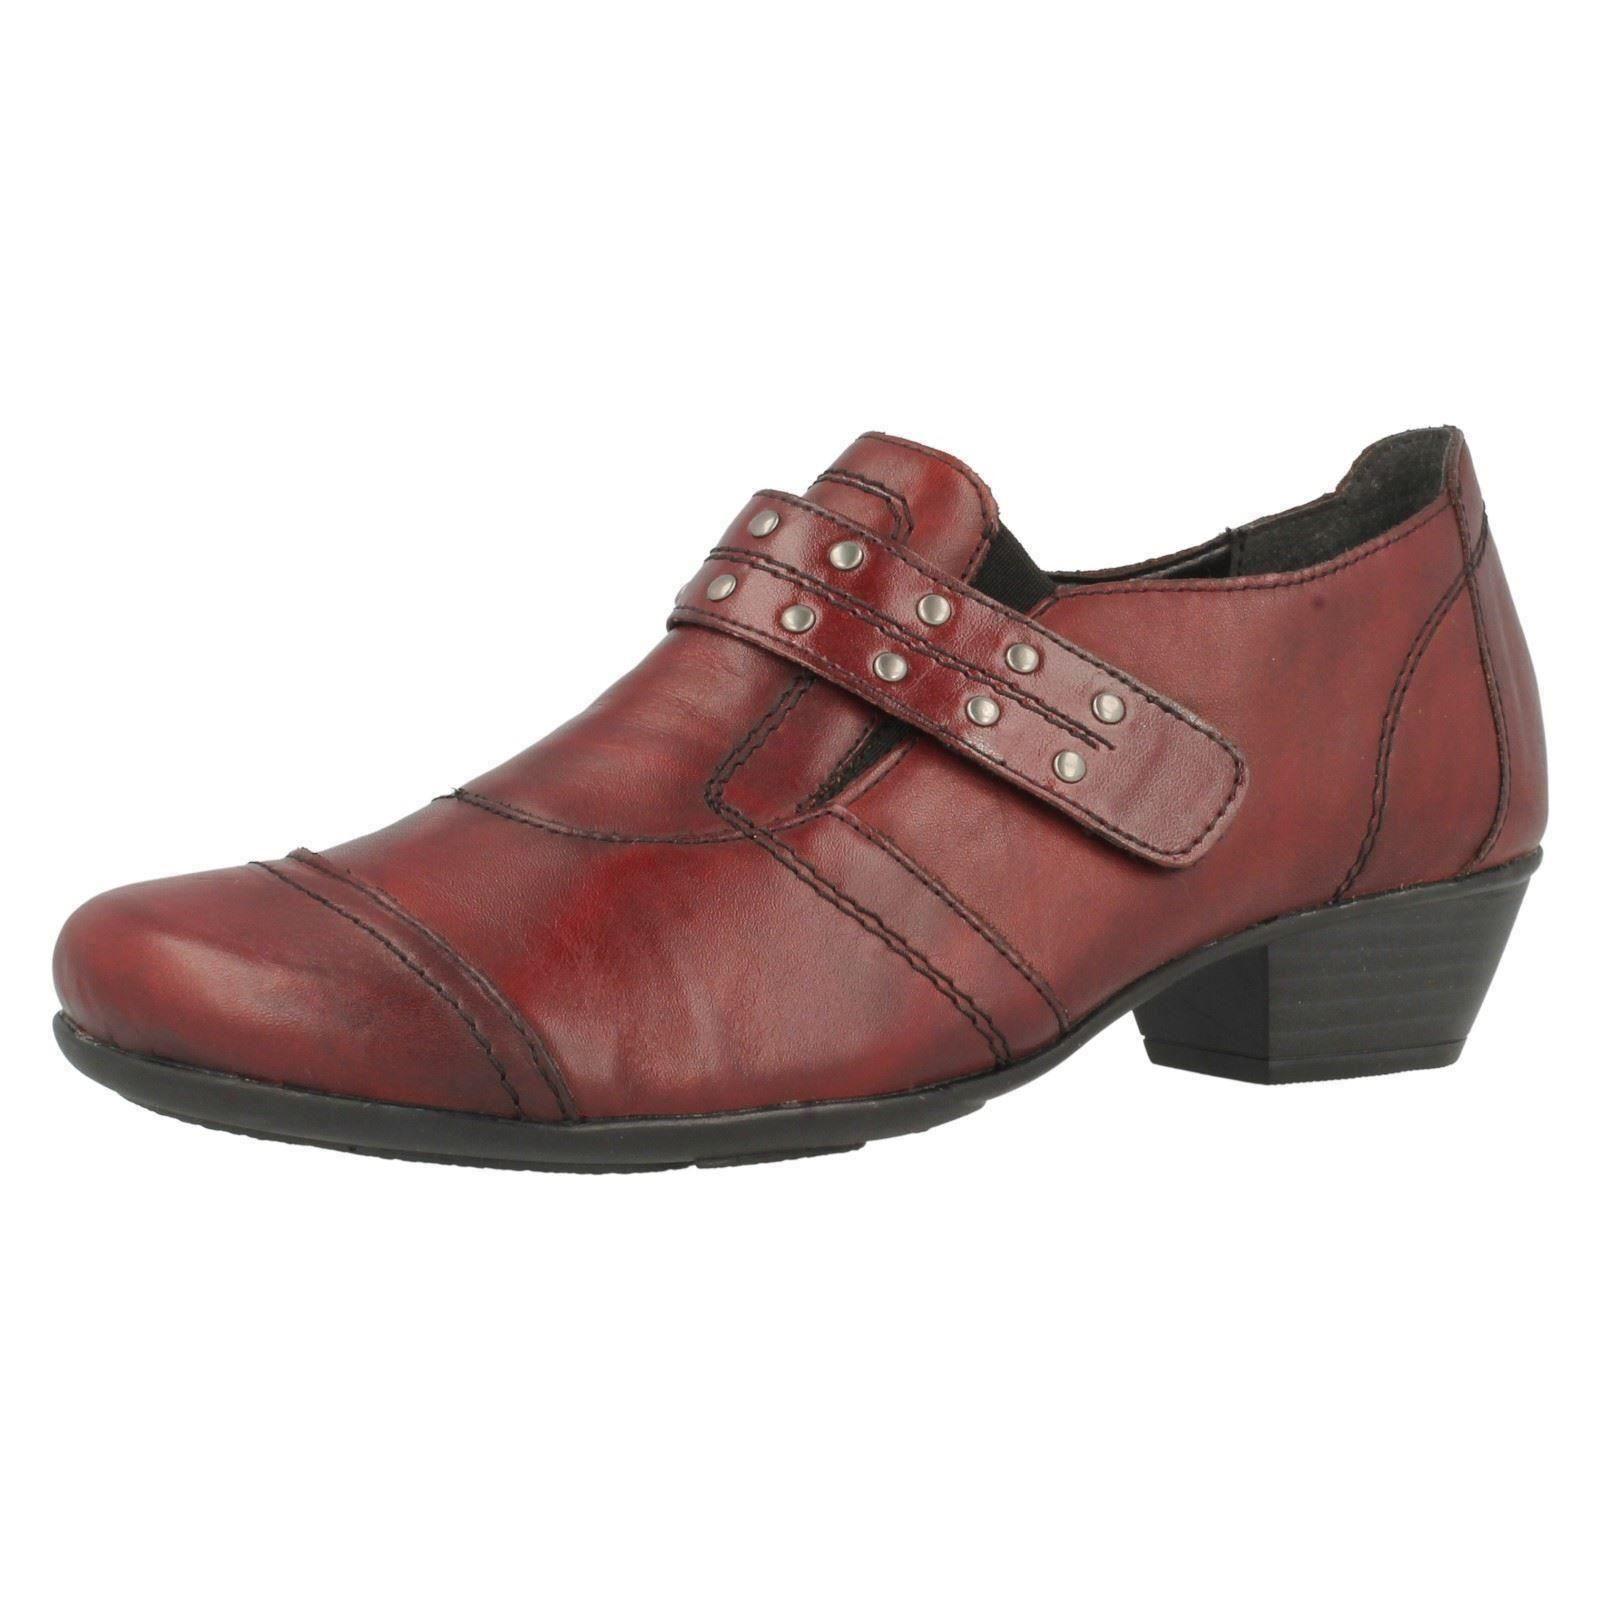 Ladies Remonte Smart Dorndorf D7331-35 Red Leather Smart Remonte Shoes e2609d